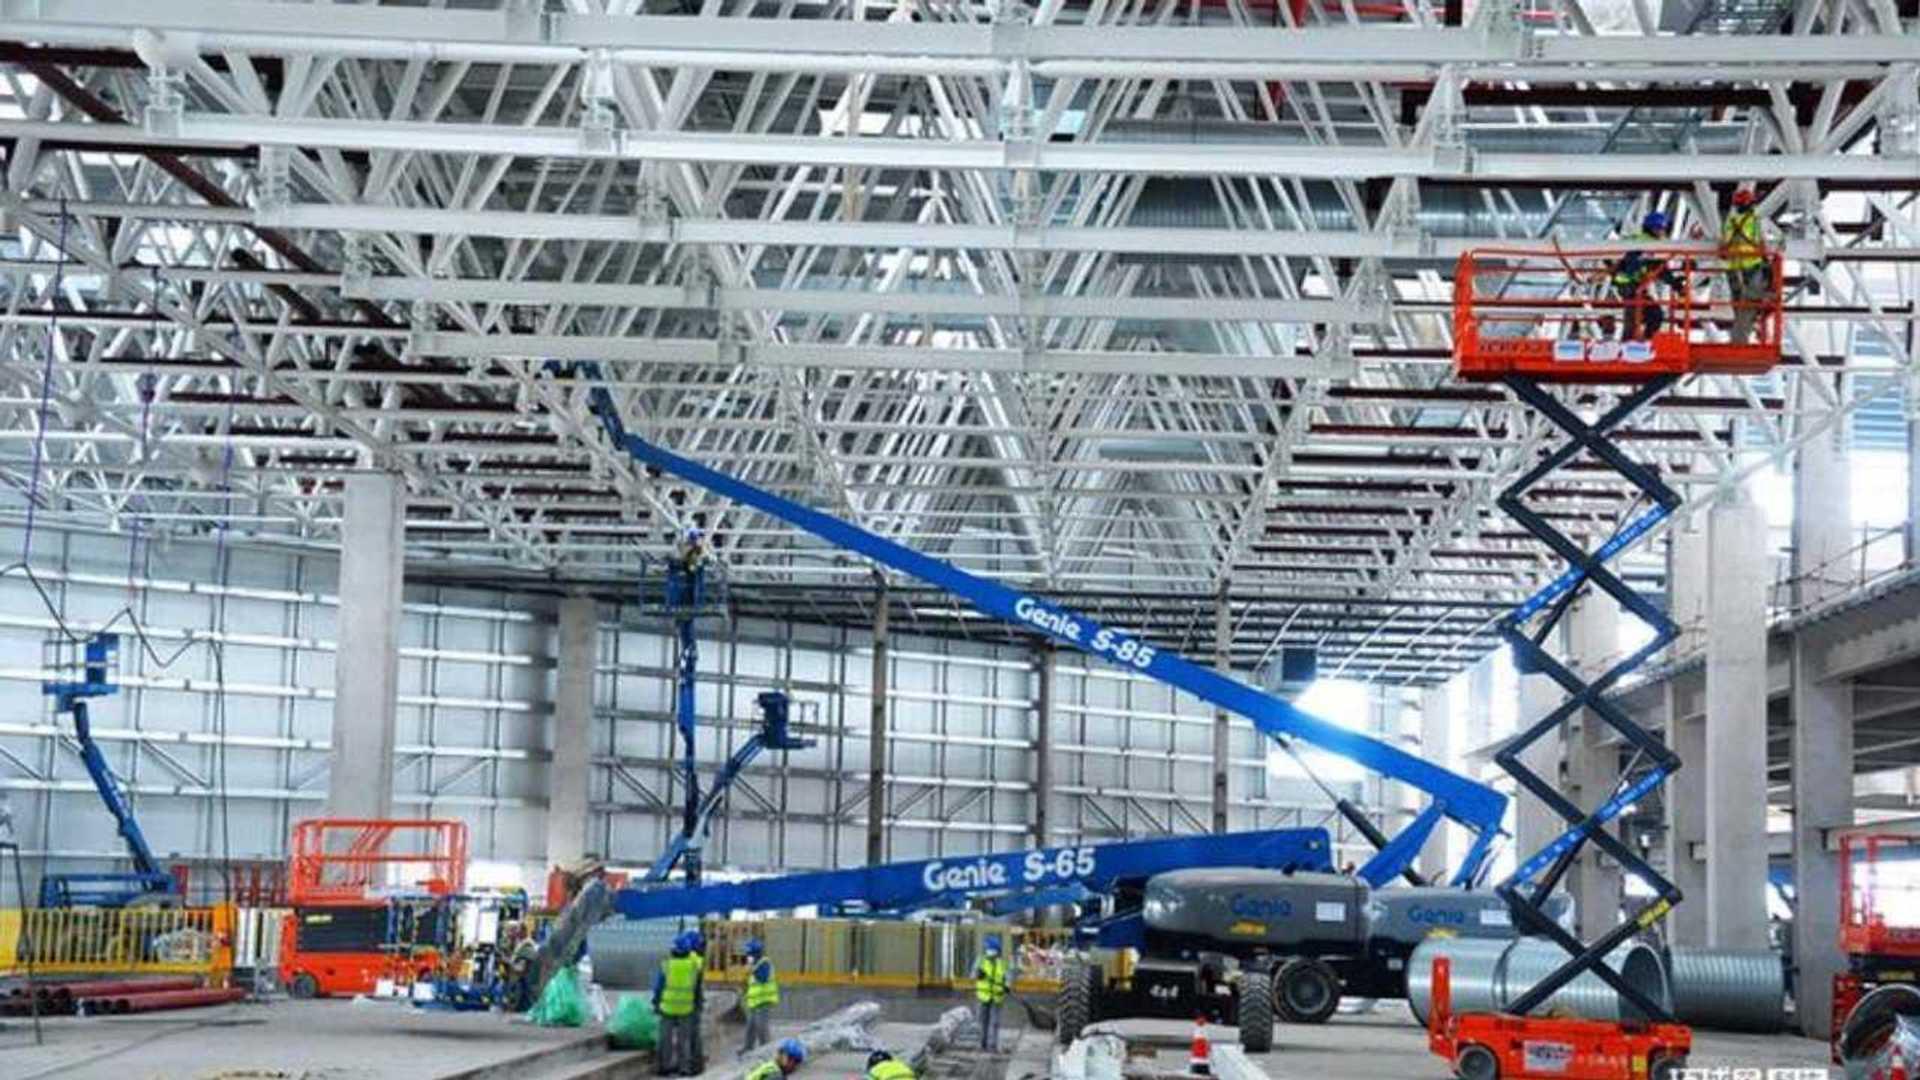 Tesla Gigafactory 3 Employees Begin Work This Month